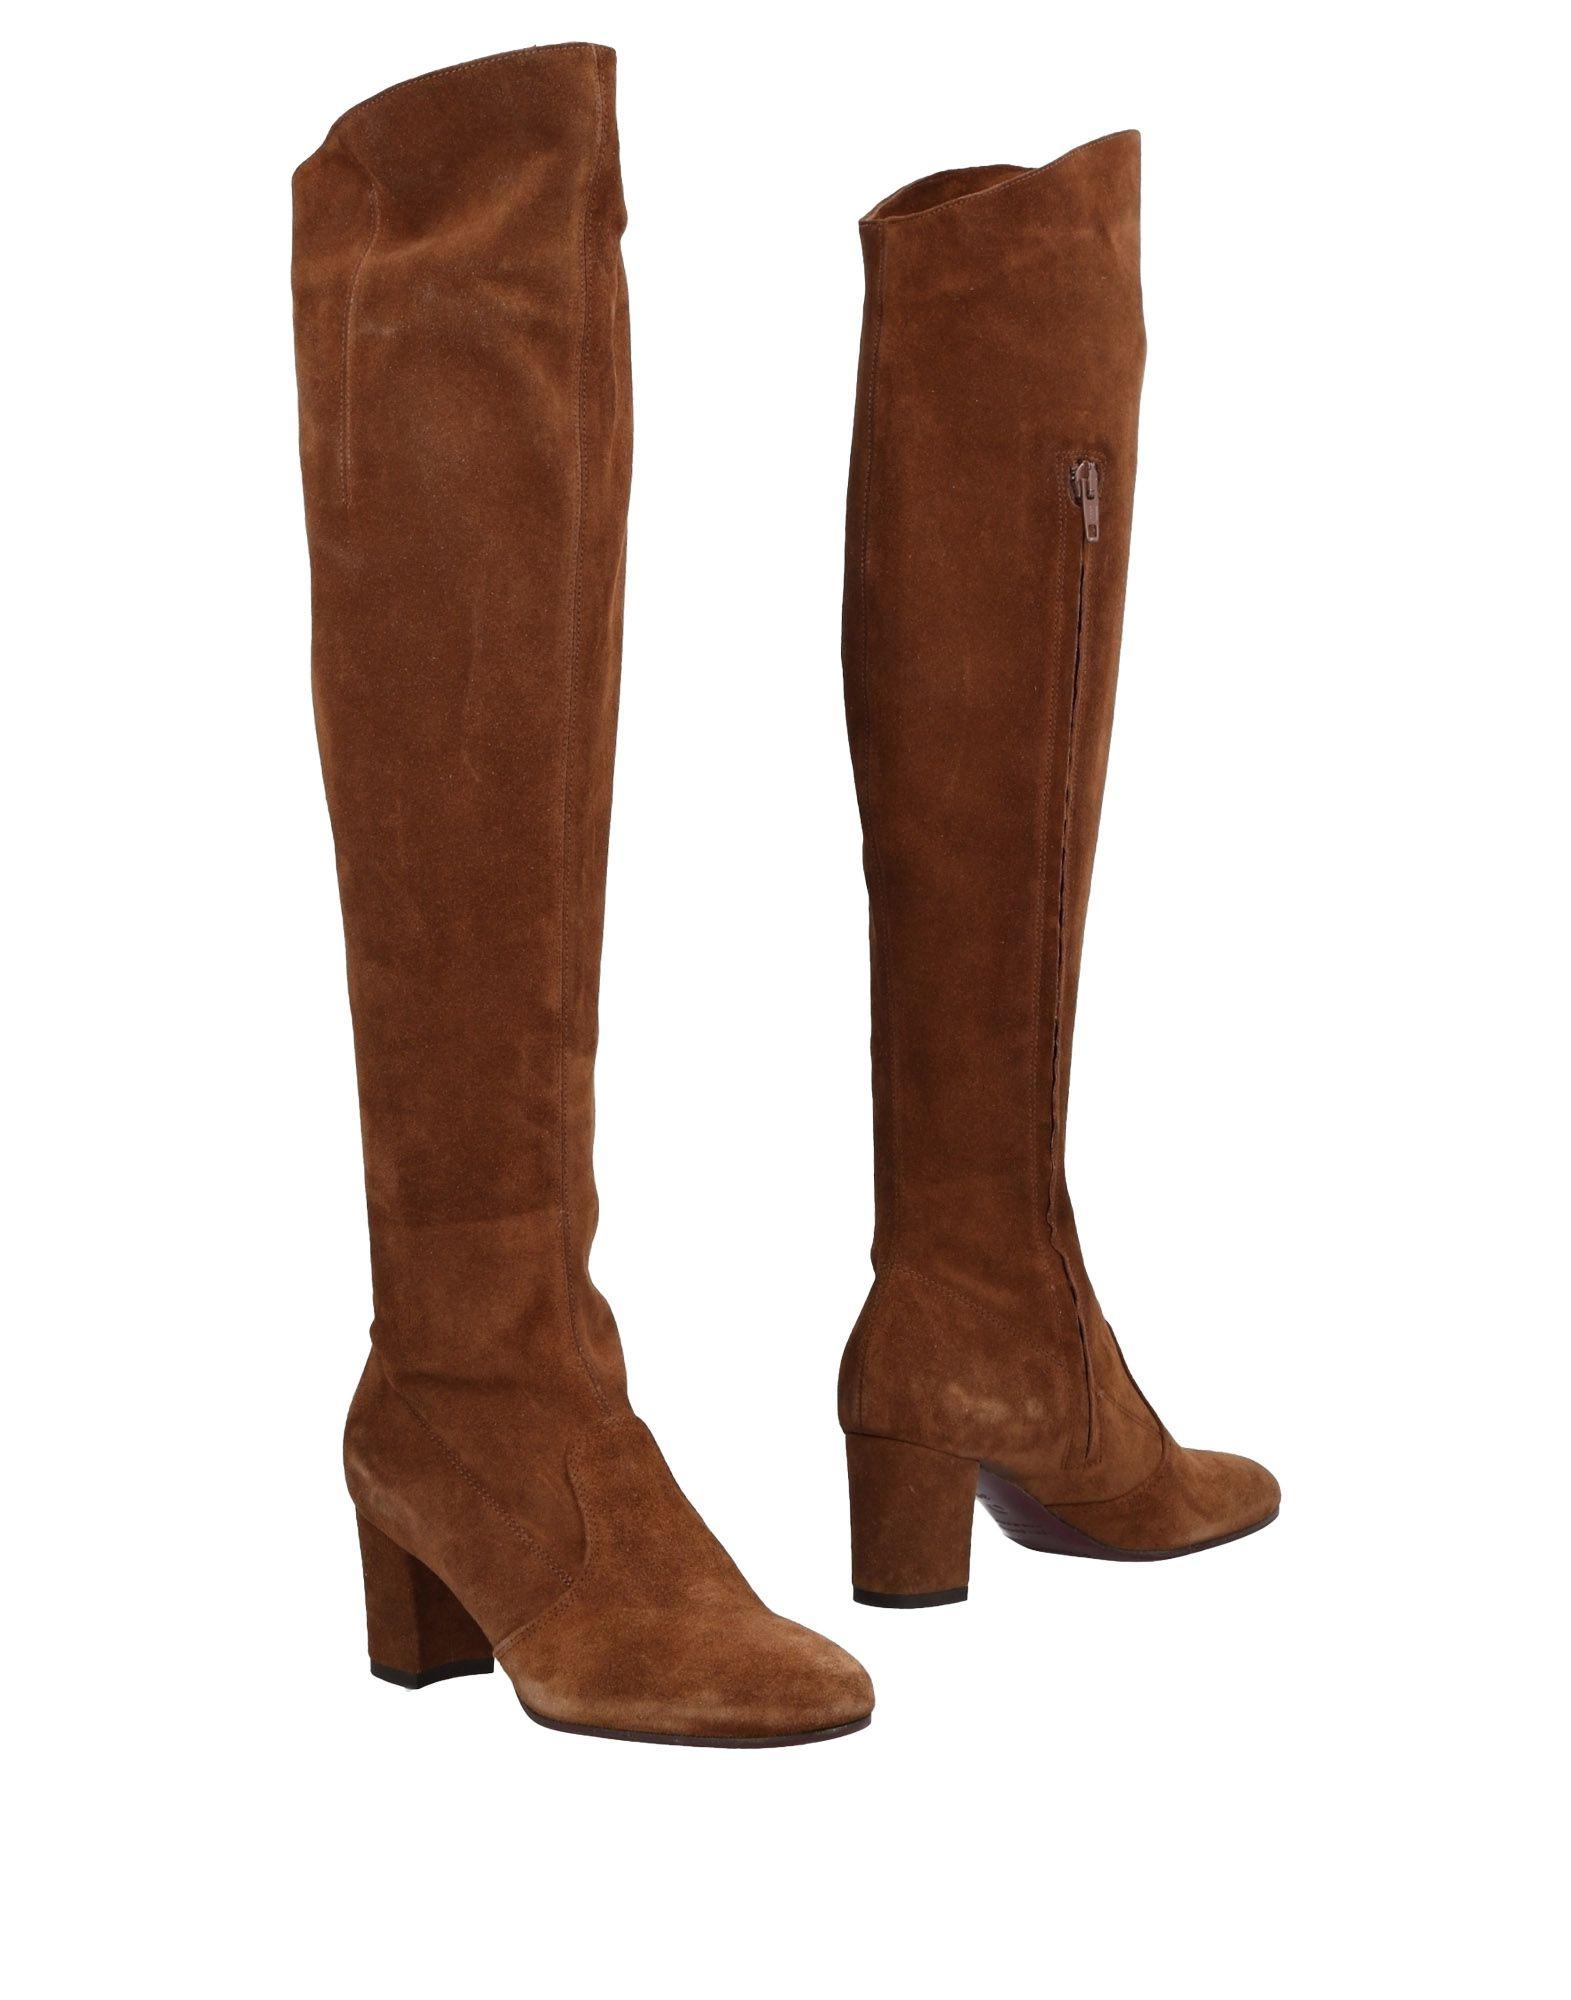 L' Autre Chose Stiefel Damen  11488149NKGut aussehende strapazierfähige Schuhe